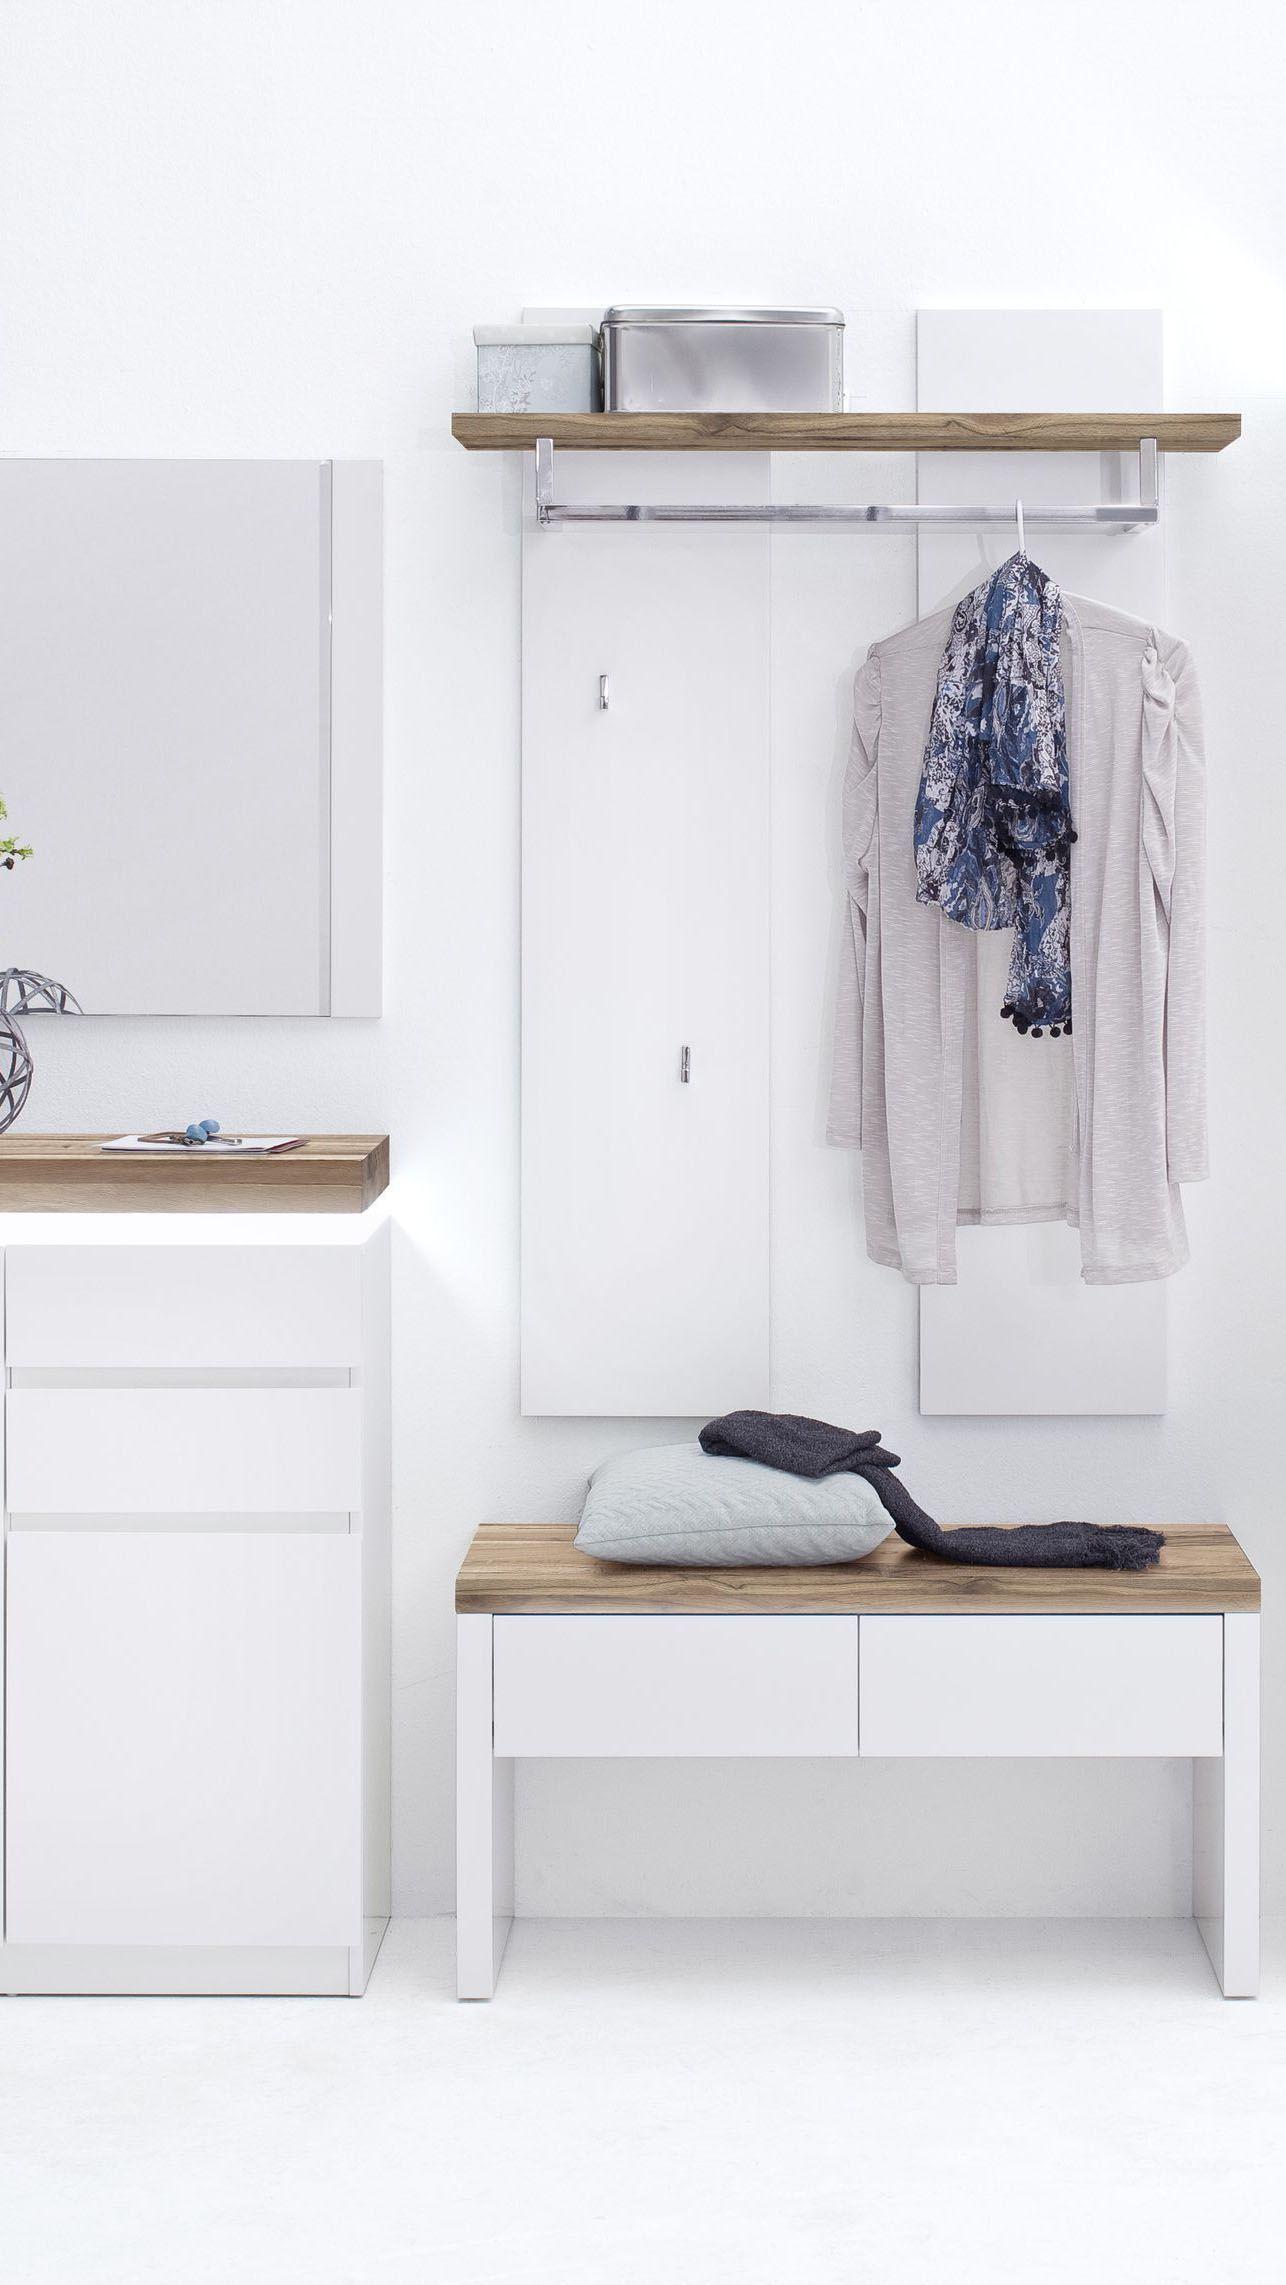 Garderoben Set Murio Garderoben Set Garderobe Garderobenset